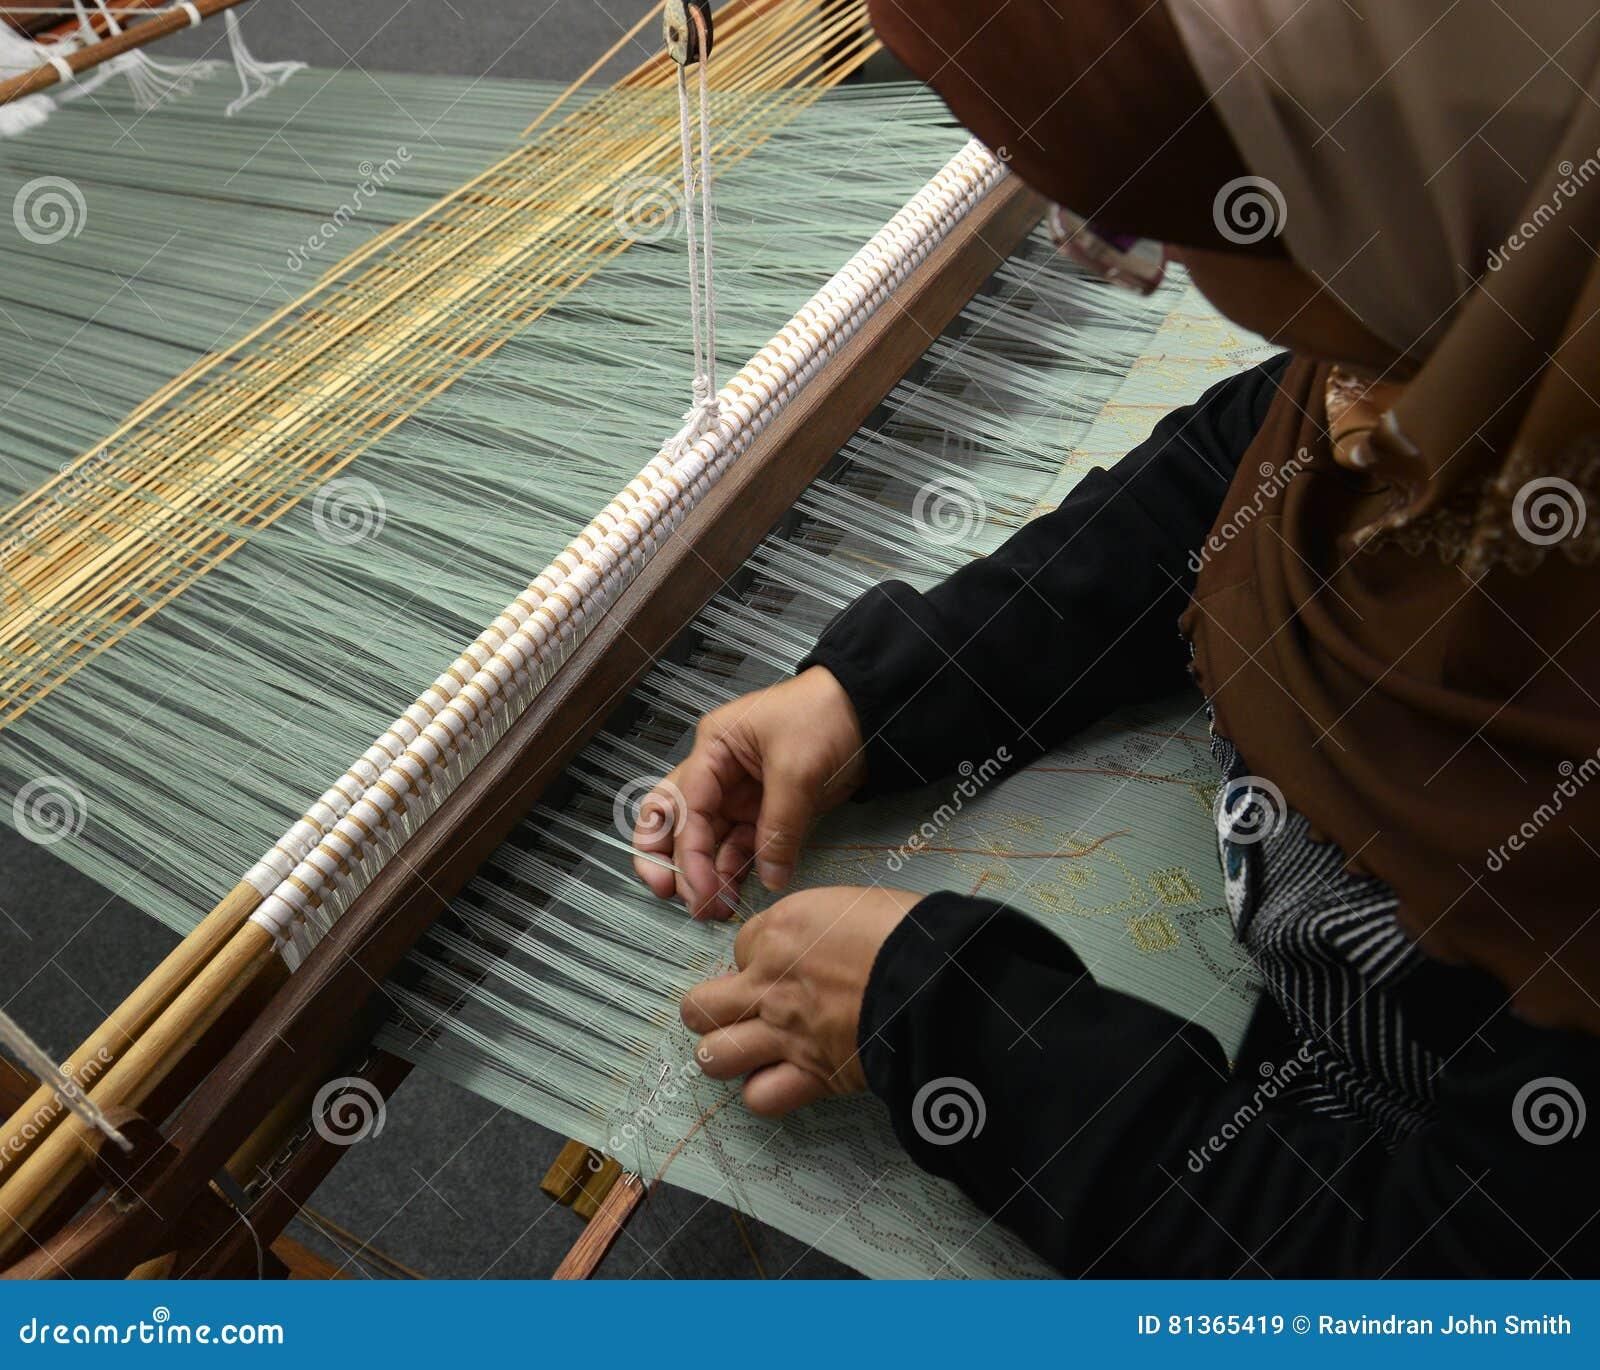 Batik design royalty free stock photos image 29546988 - Songket Making Royalty Free Stock Images